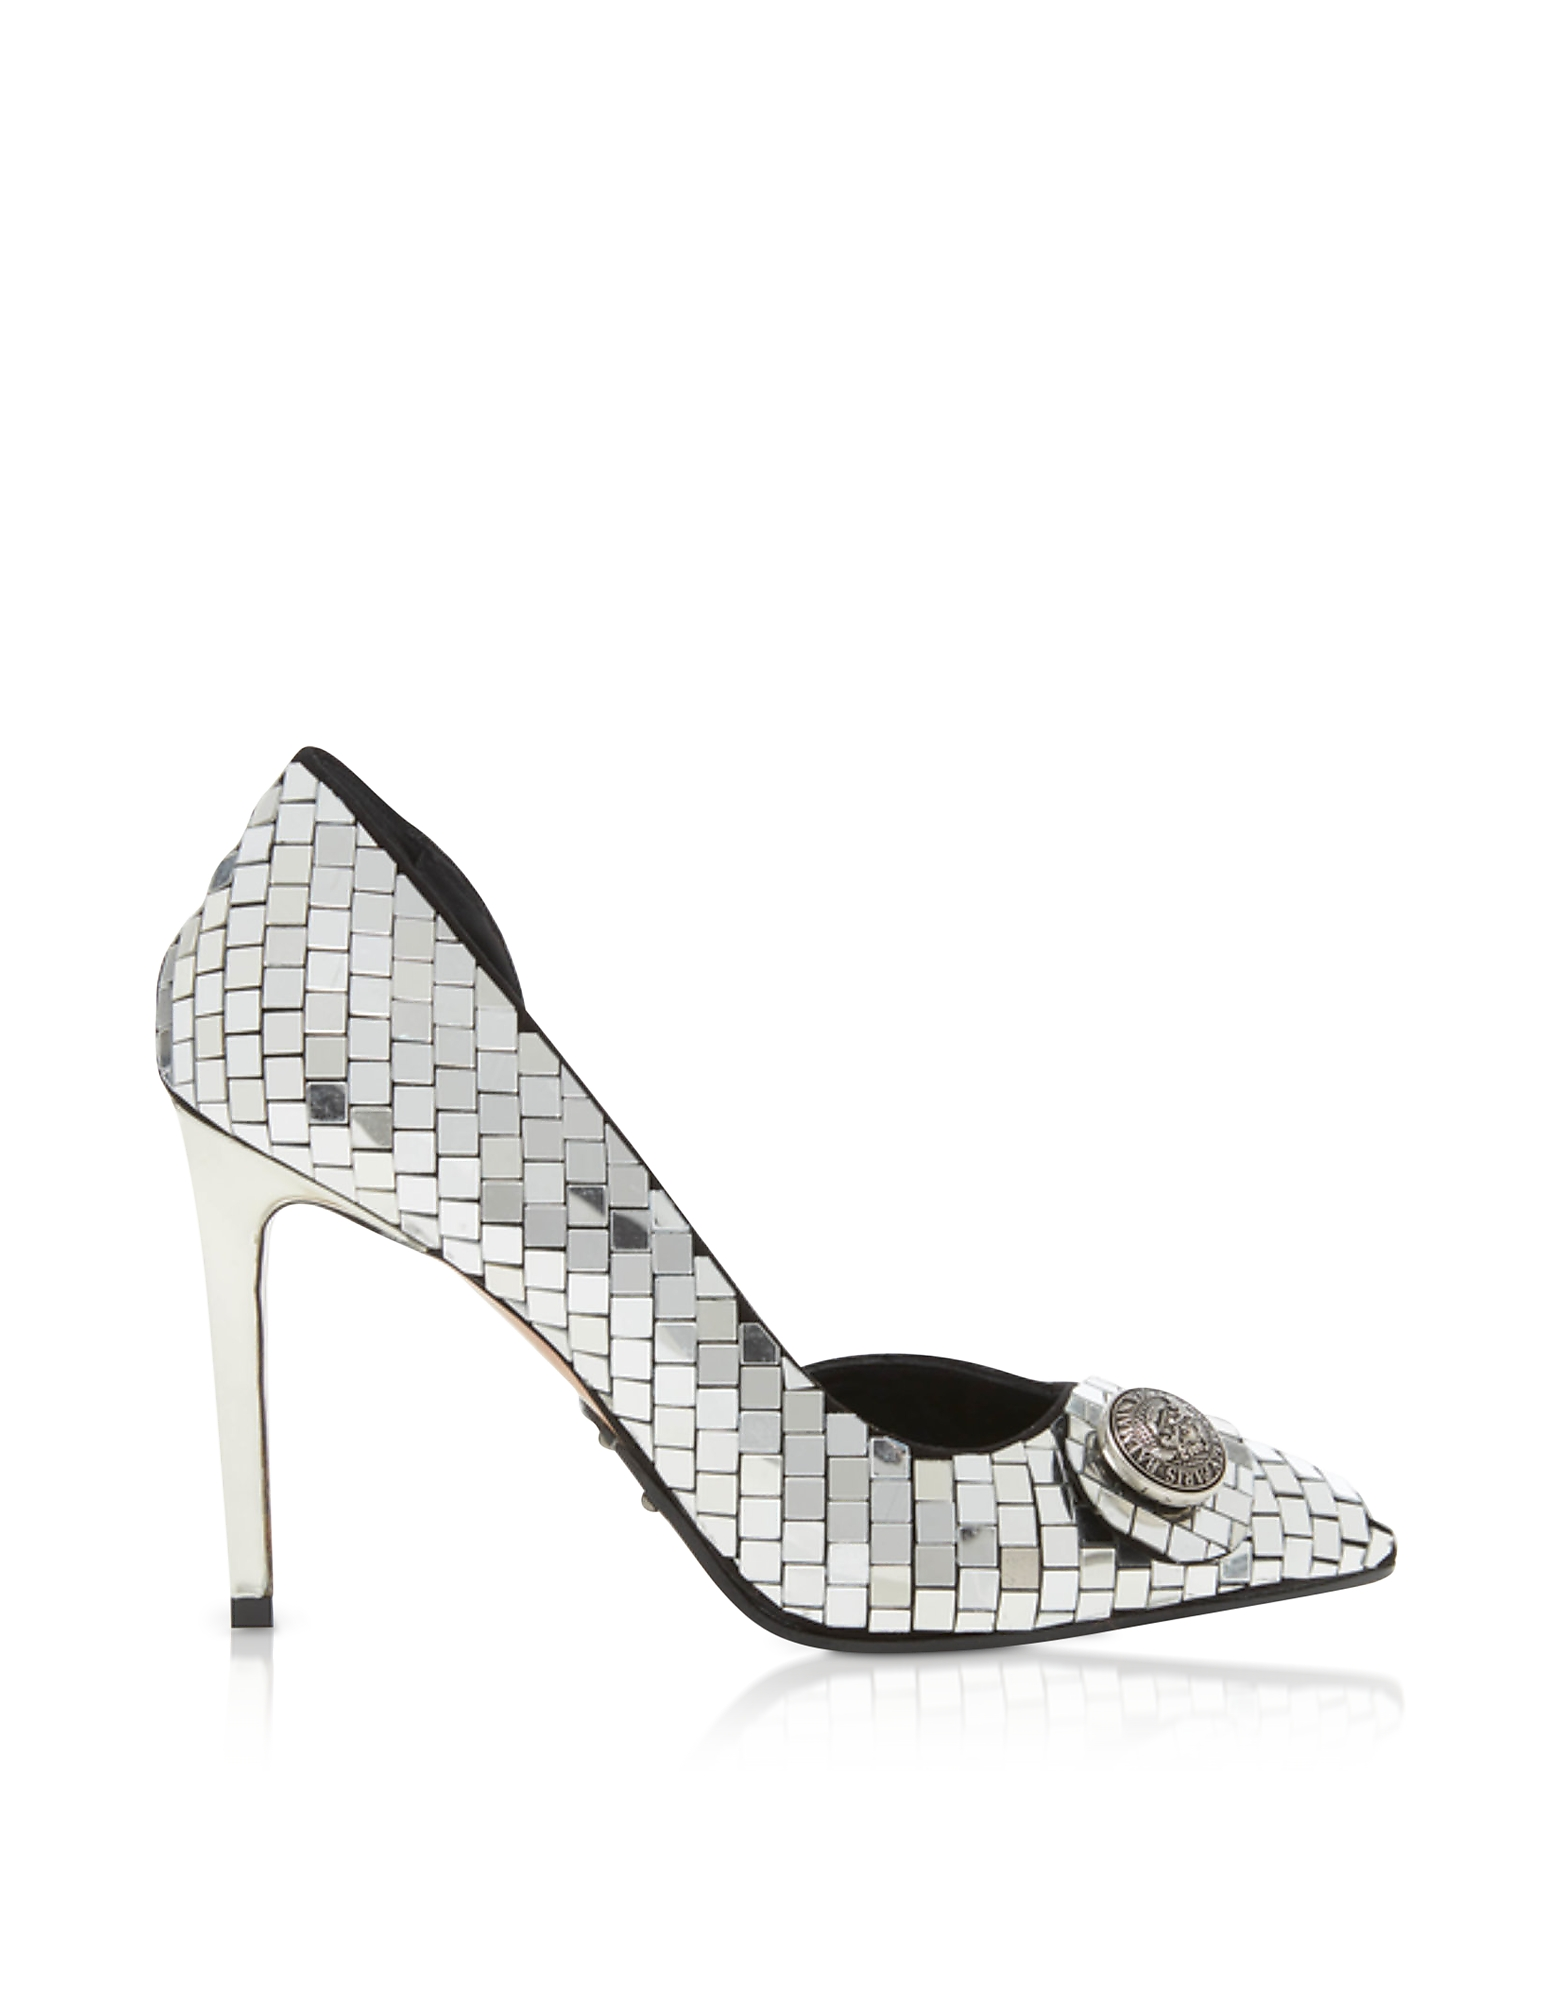 Balmain Designer Shoes, Mirror Leather 95MM Julie Pump